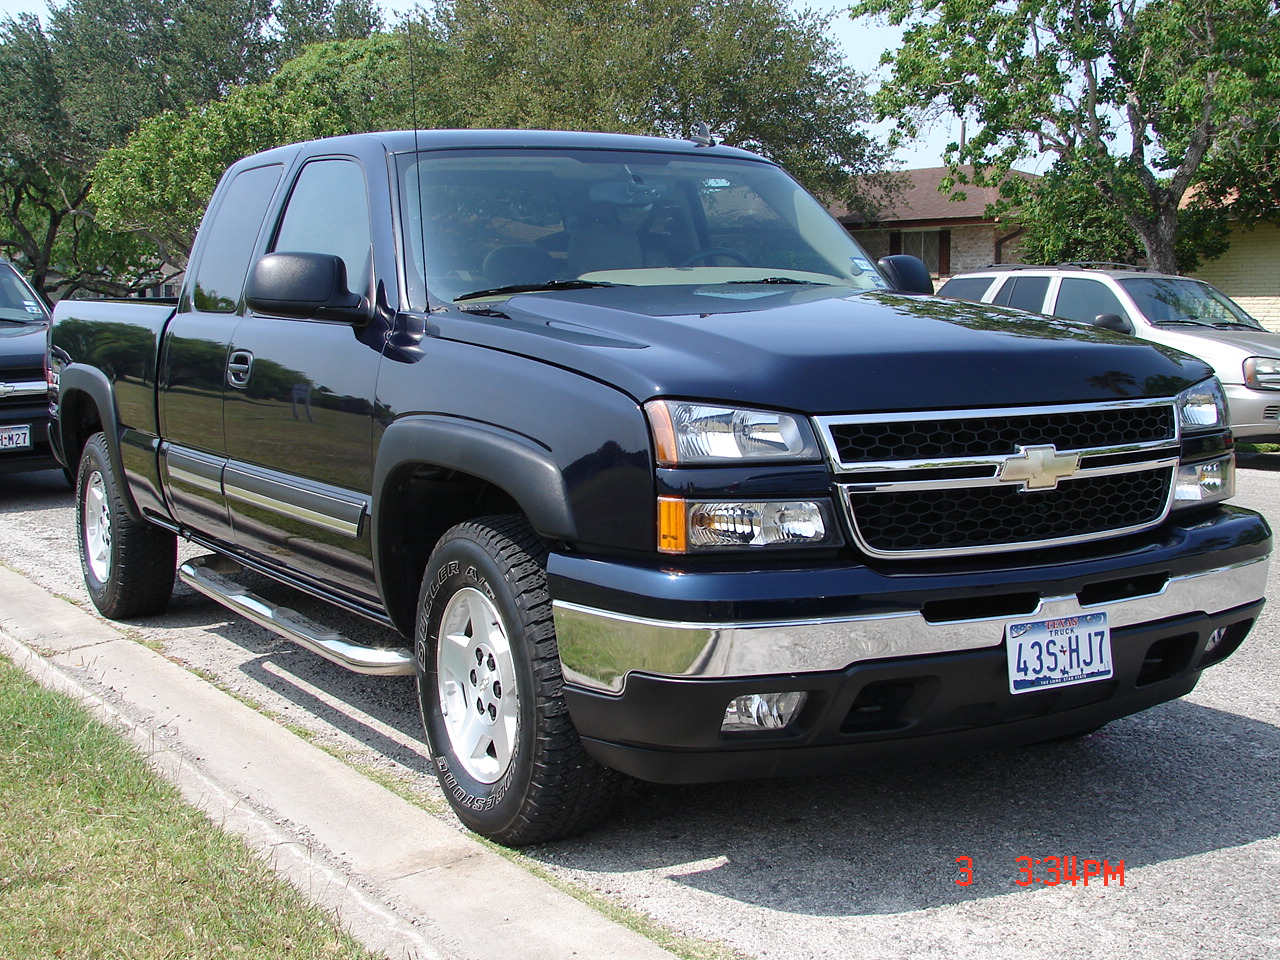 2006 chevrolet silverado 1500 2007 chevrolet silverado 1500 ltz. Cars Review. Best American Auto & Cars Review